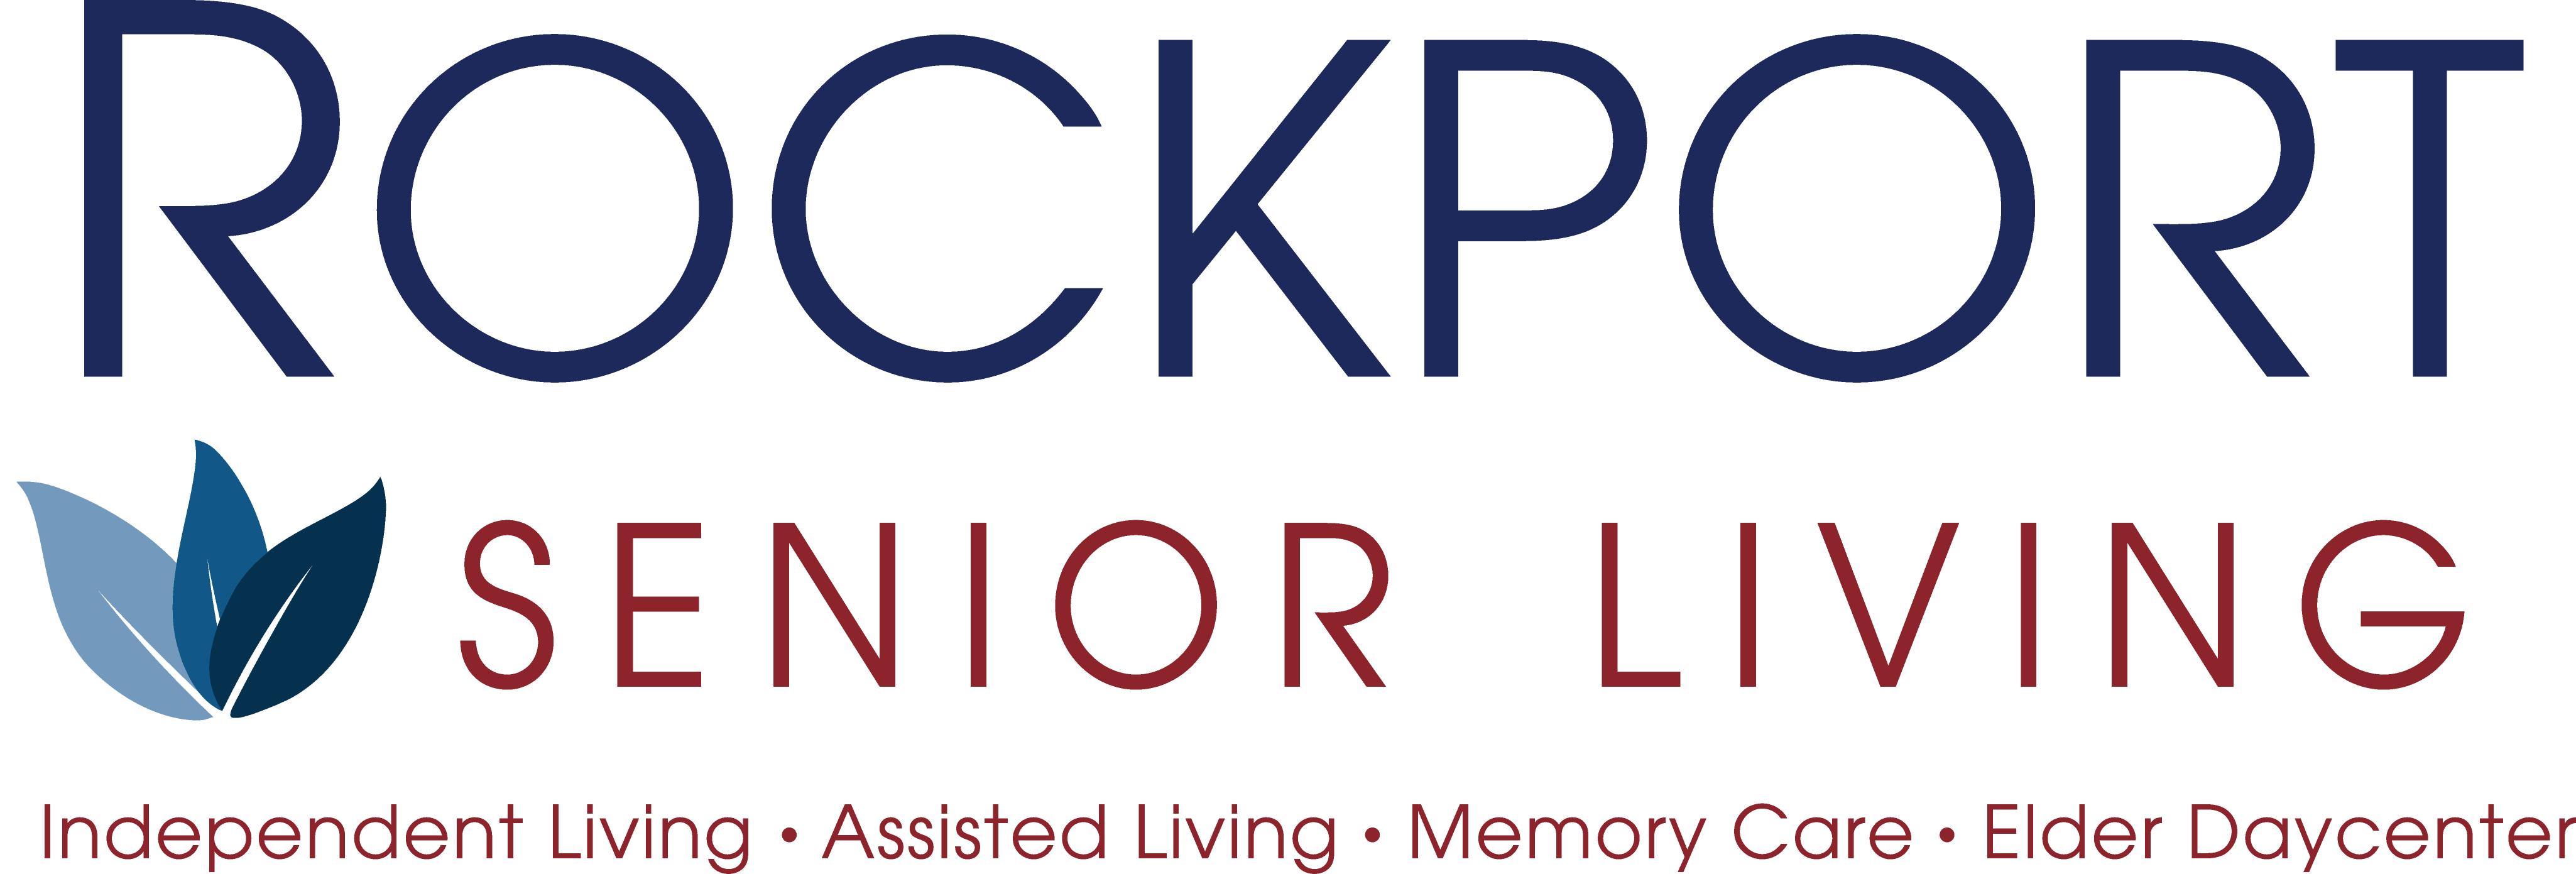 Rockport Senior Living